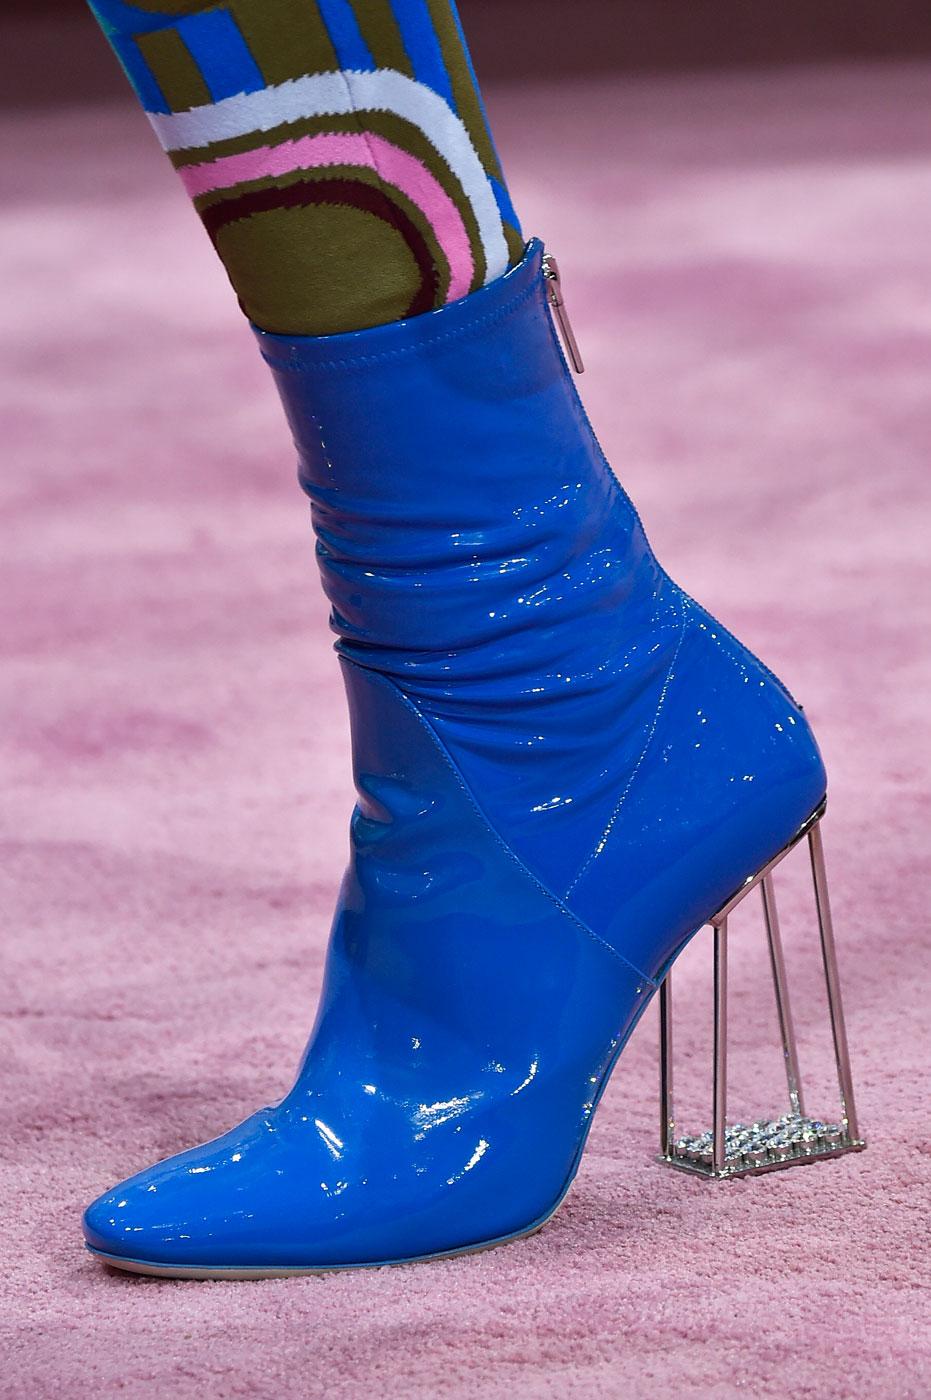 Christian-Dior-fashion-runway-show-close-ups-haute-couture-paris-spring-summer-2015-the-impression-176